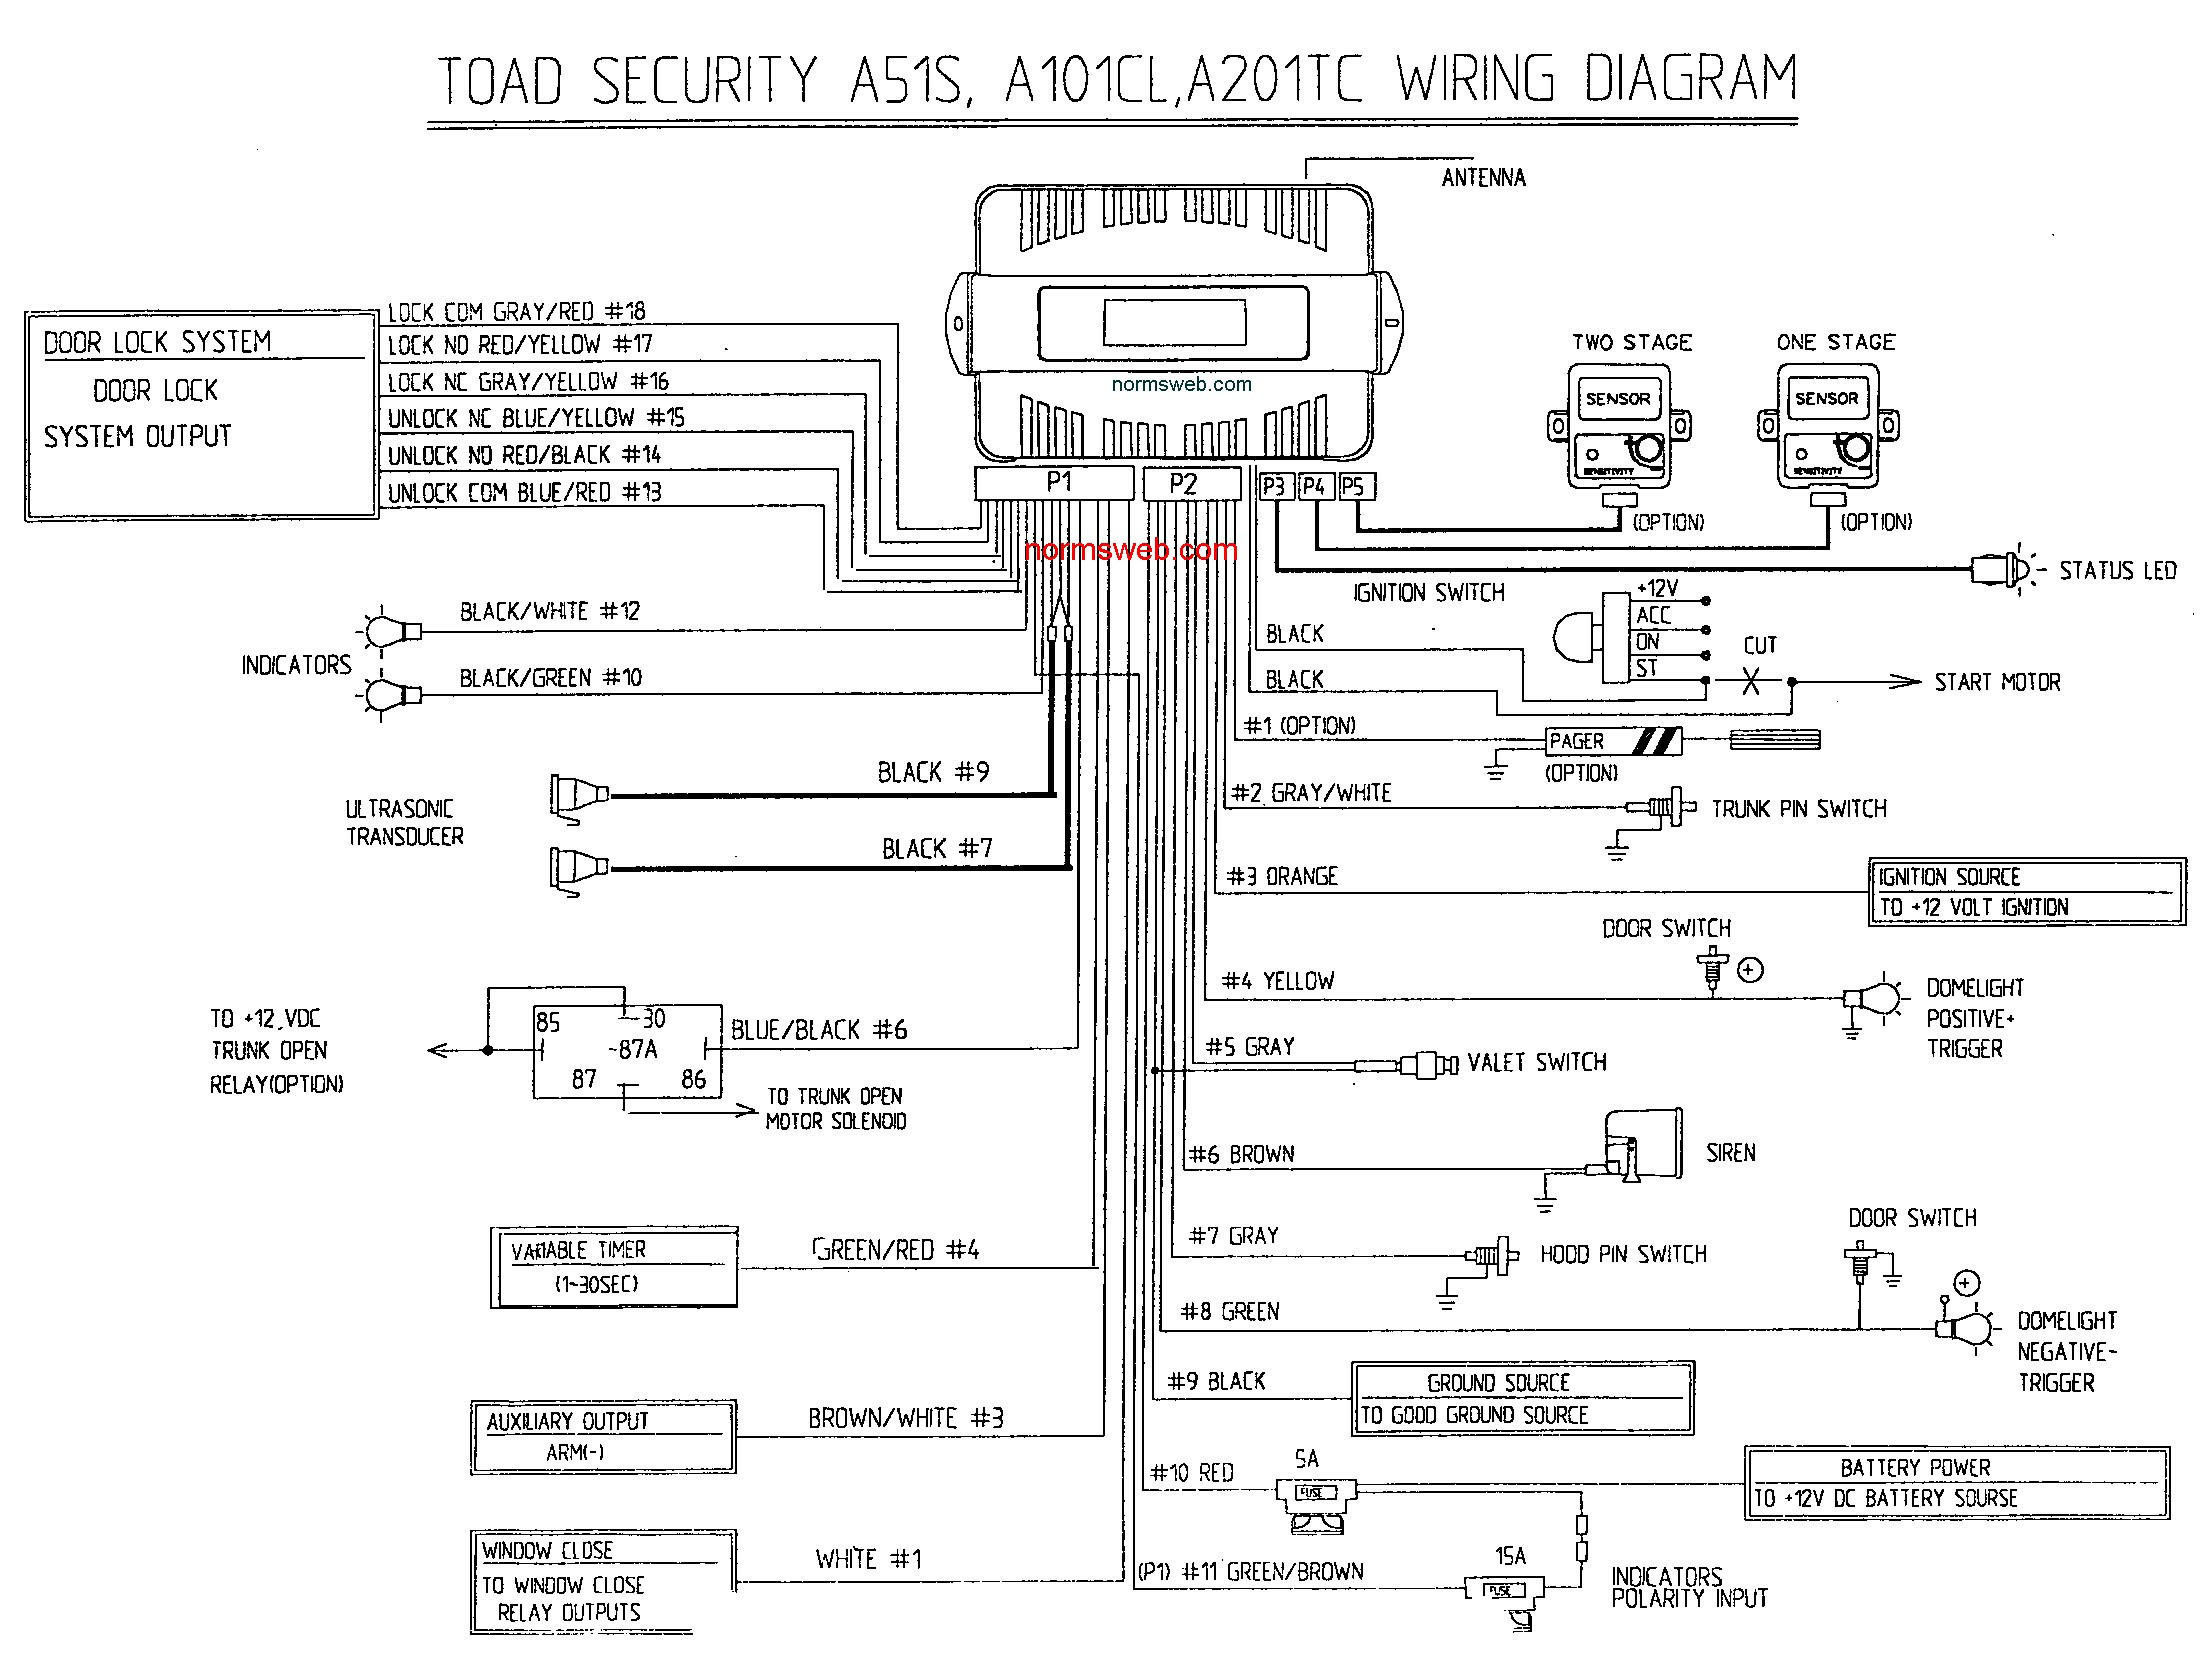 Viper 5706v Manual Pdf Diagram] Viper 5706v Wiring Diagram Full Version Hd Quality Wiring … Of Viper 5706v Manual Pdf